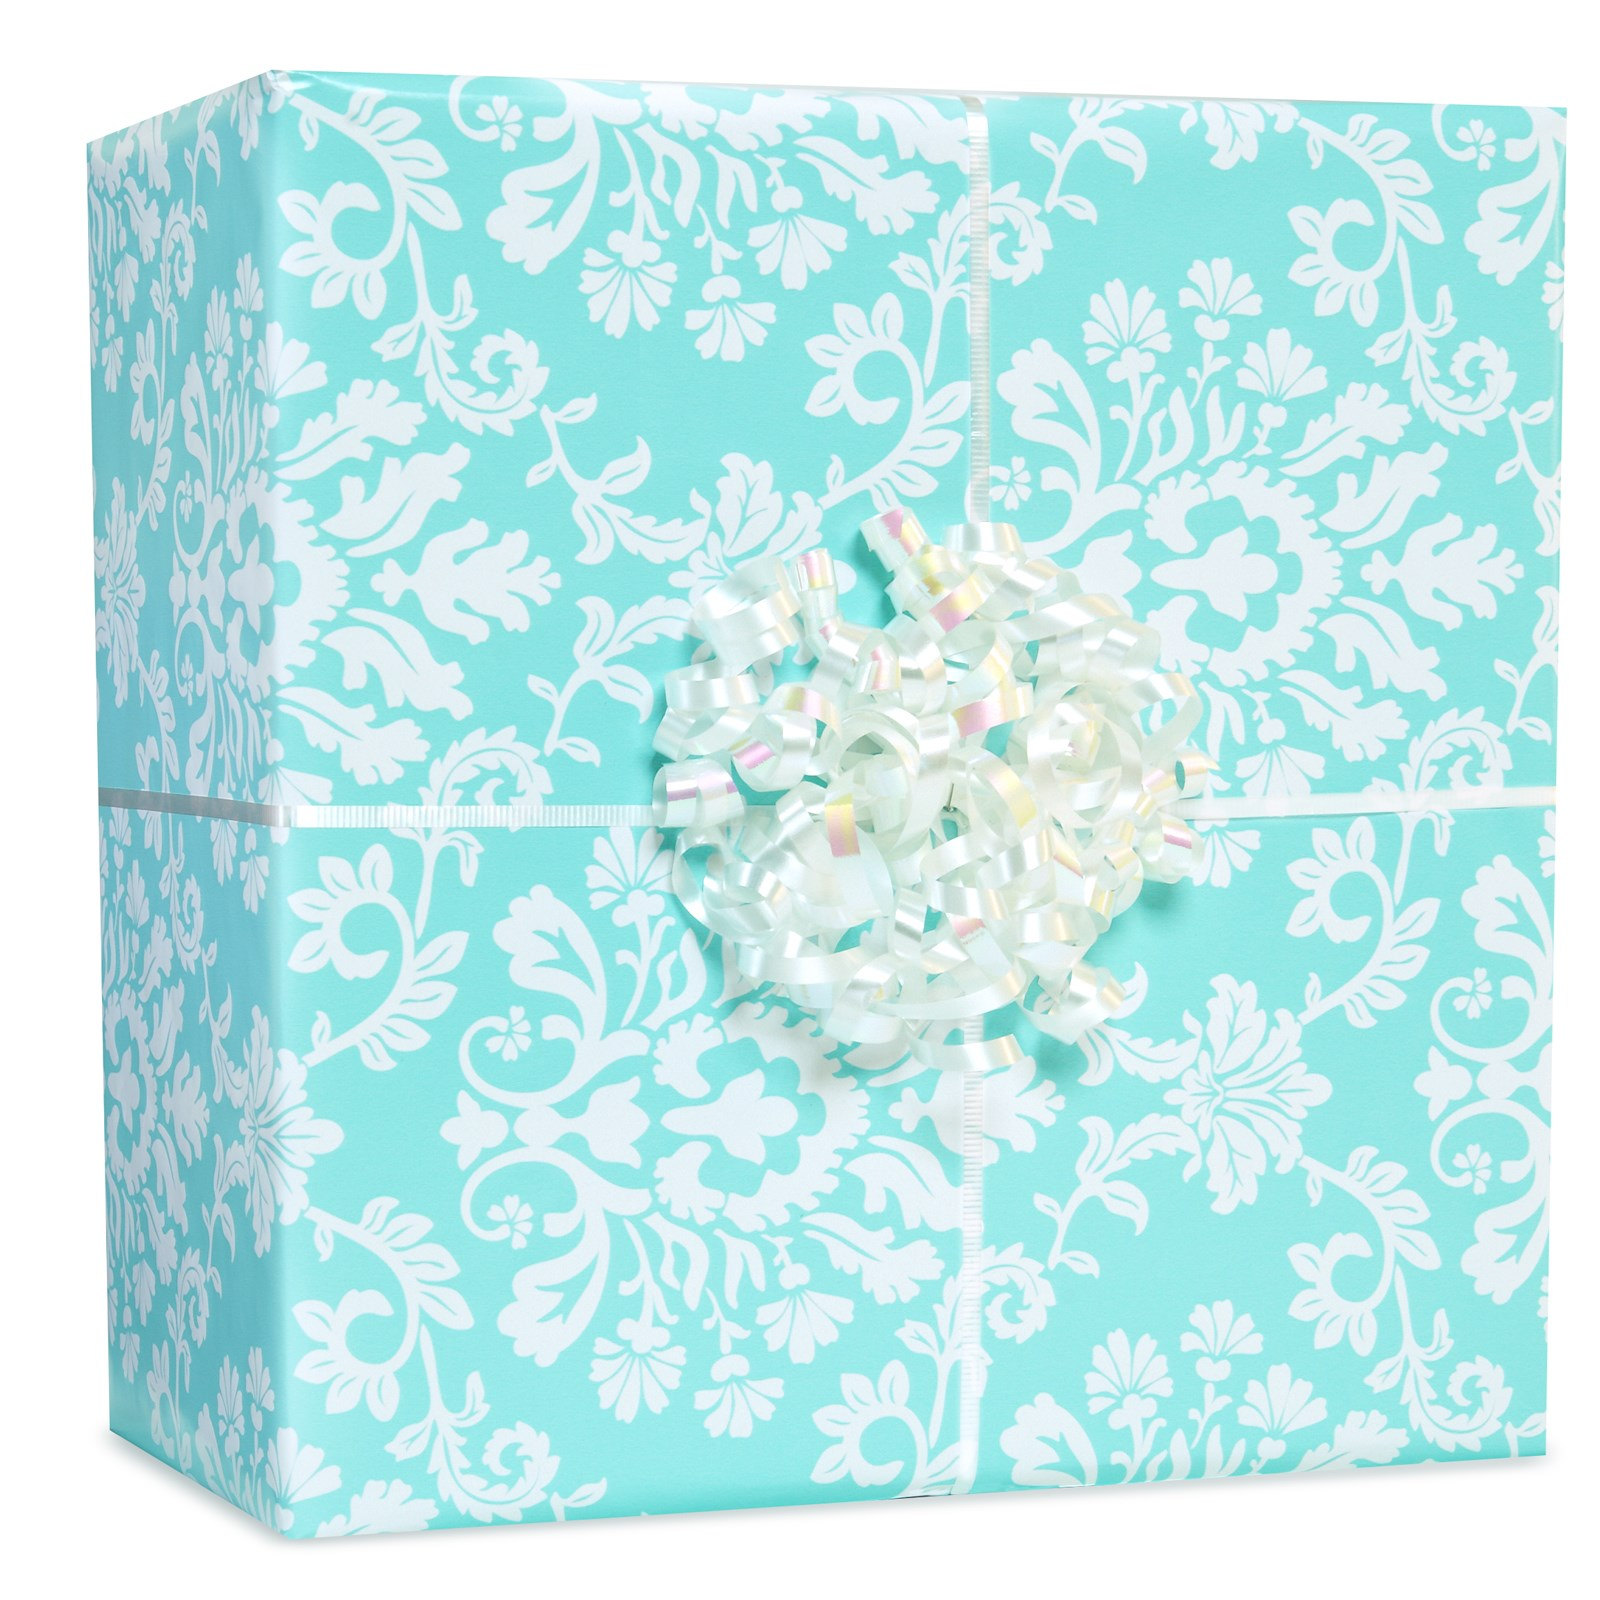 Image of Robin's Egg Blue Brocade Gift Wrap Kit